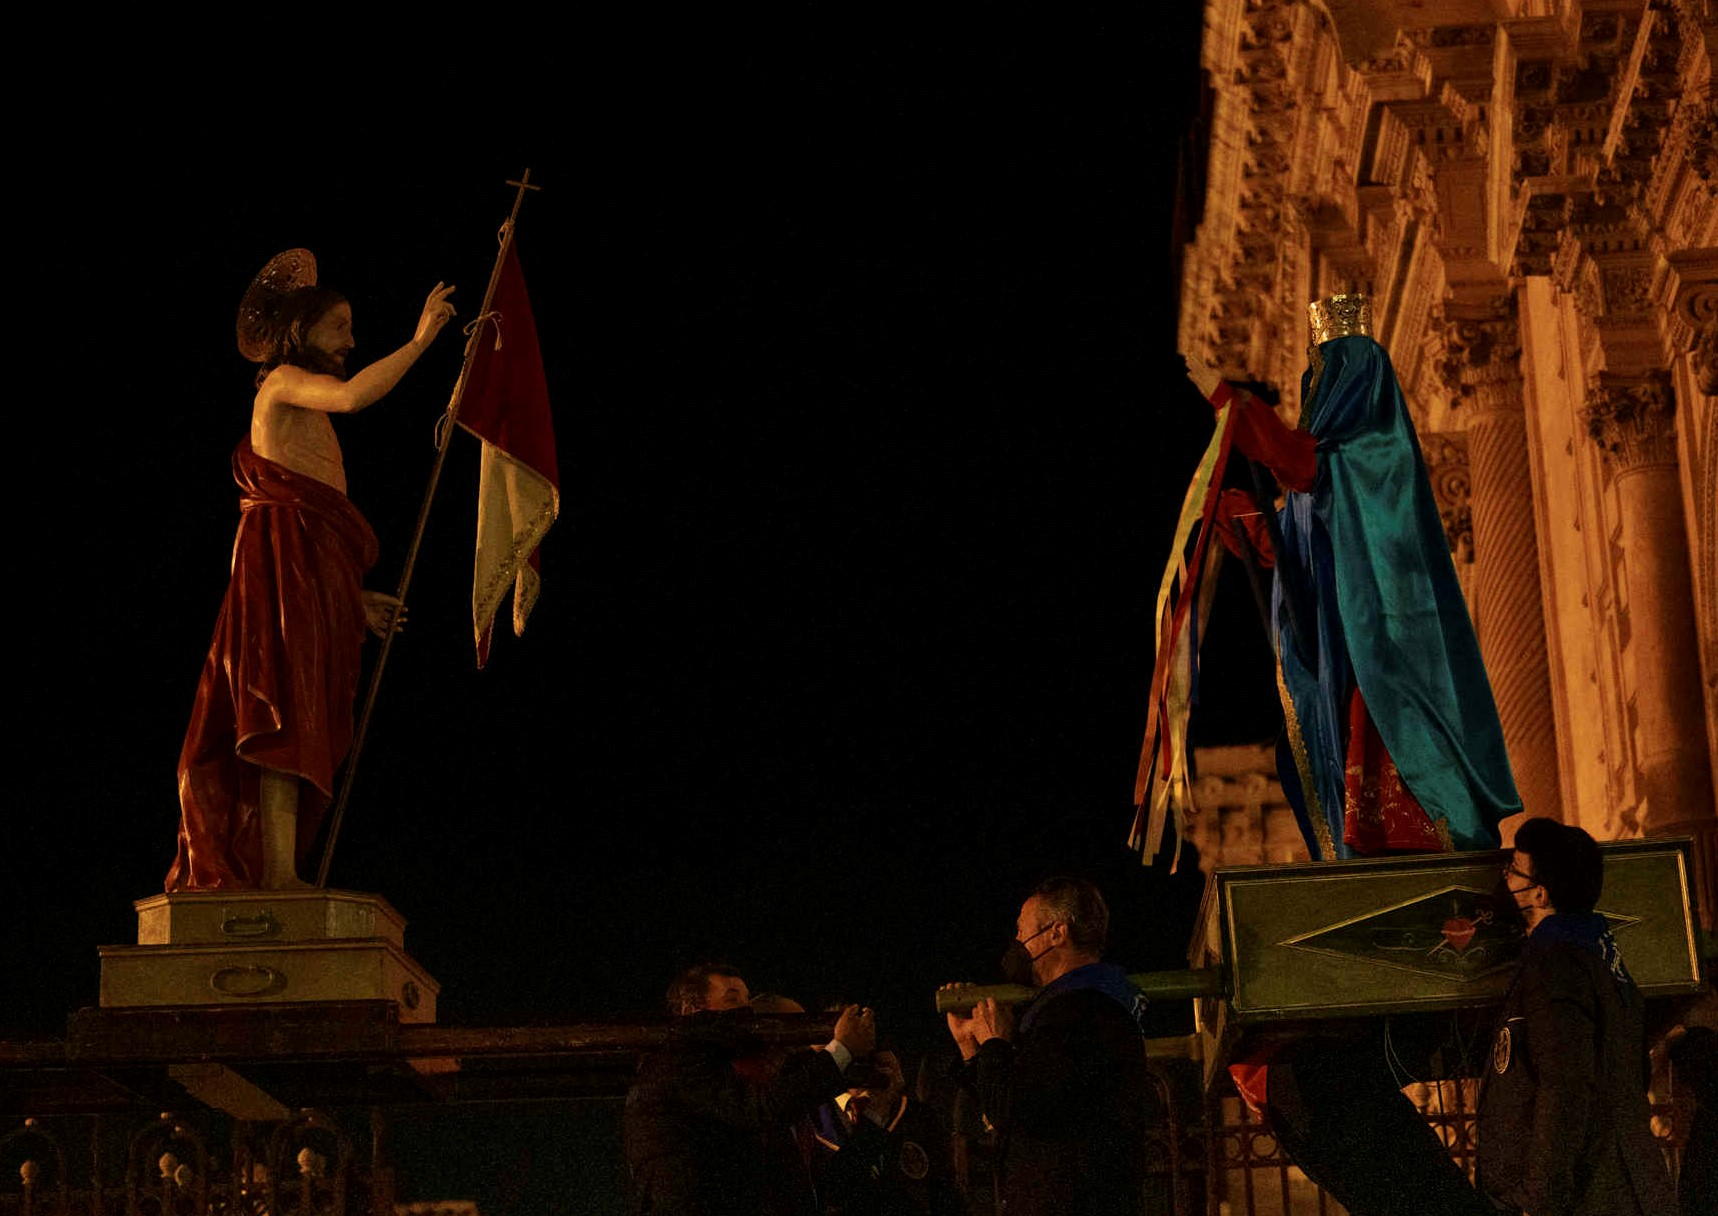 "Modica: Madonna vasa vasa ""segreta"": performance notturna dell'artista Adrian Paci"